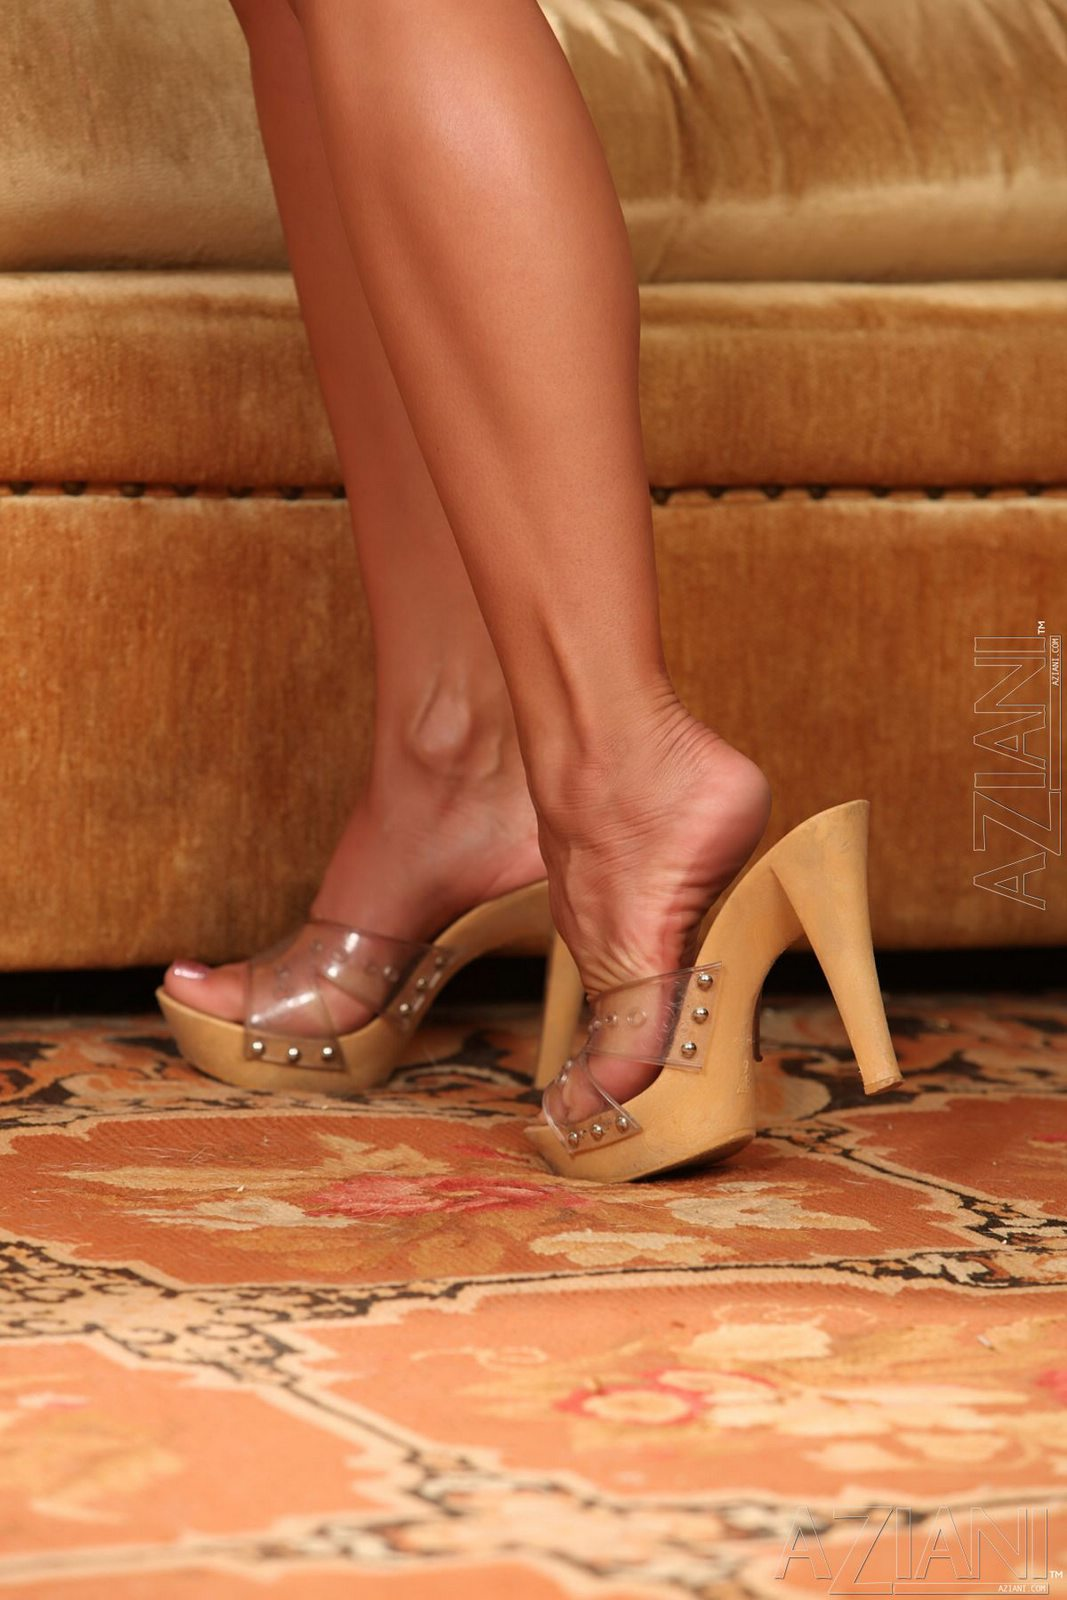 Spanian naked videoes of models girls